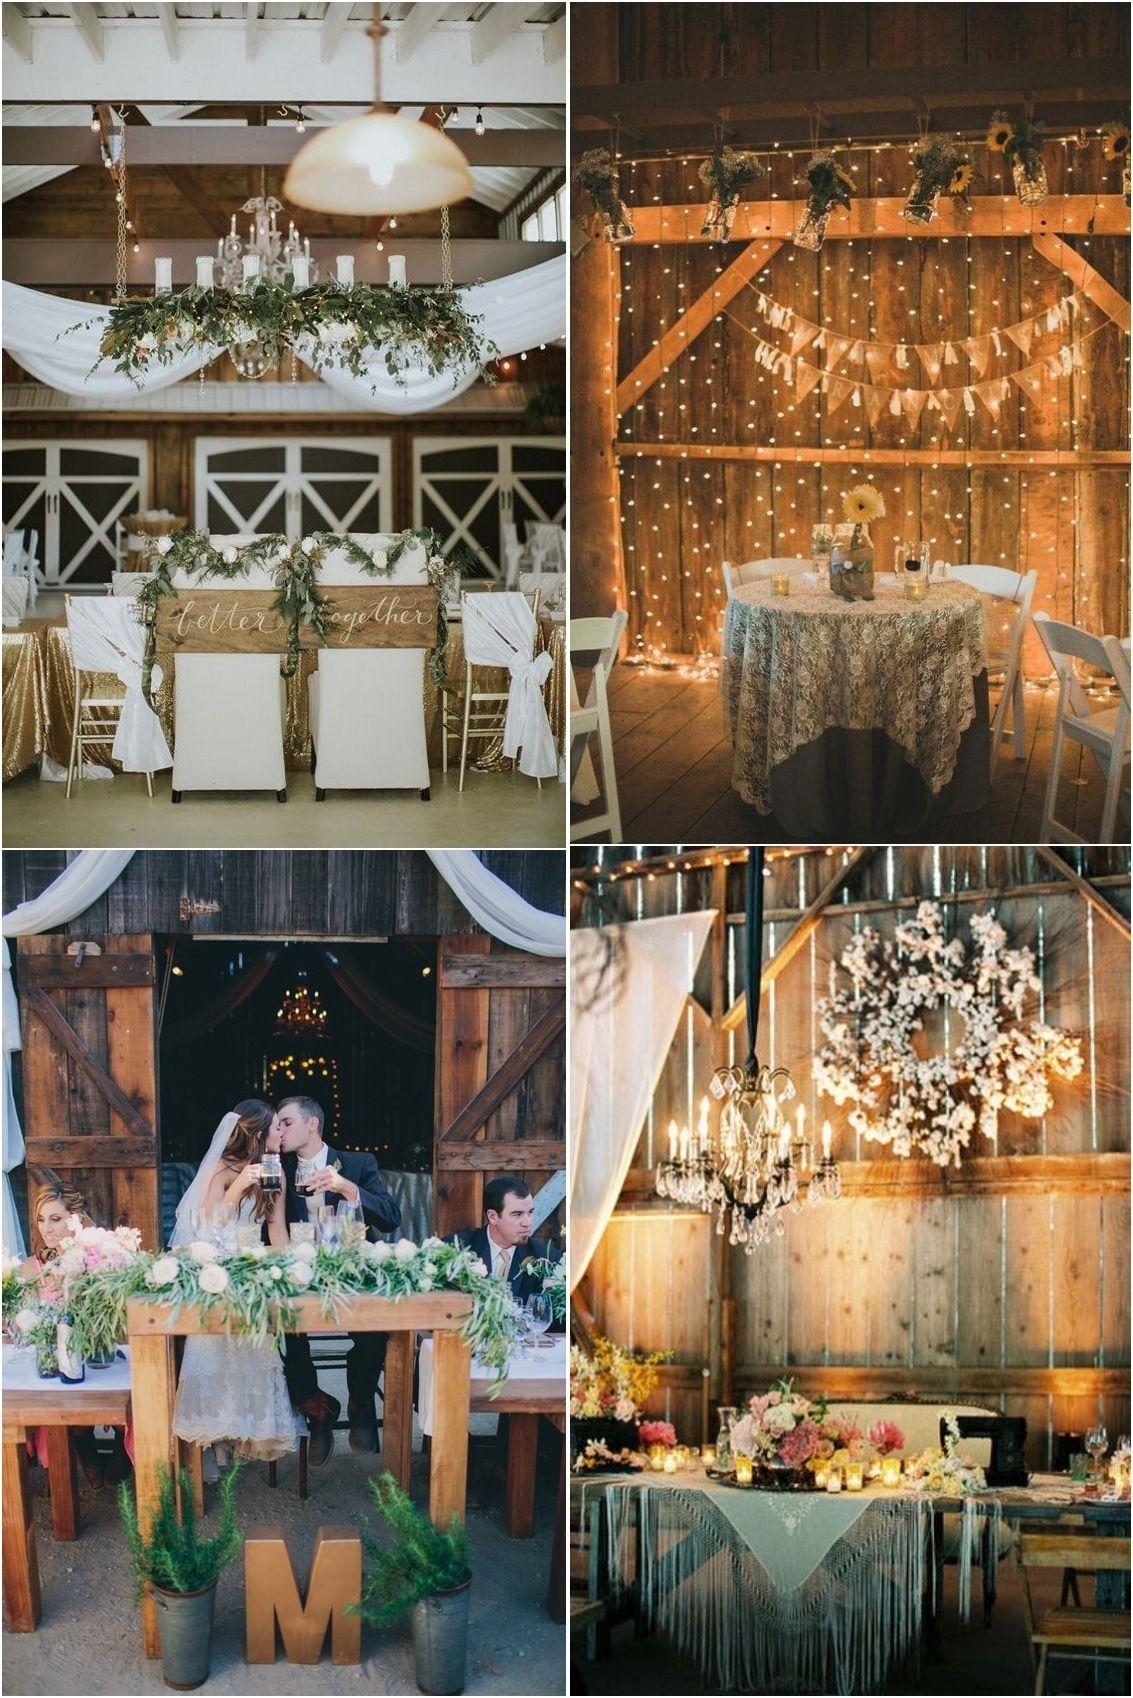 Wedding decorations barn  Top  Sweetheart Table Decor Ideas for Barn Weddings  Pinterest